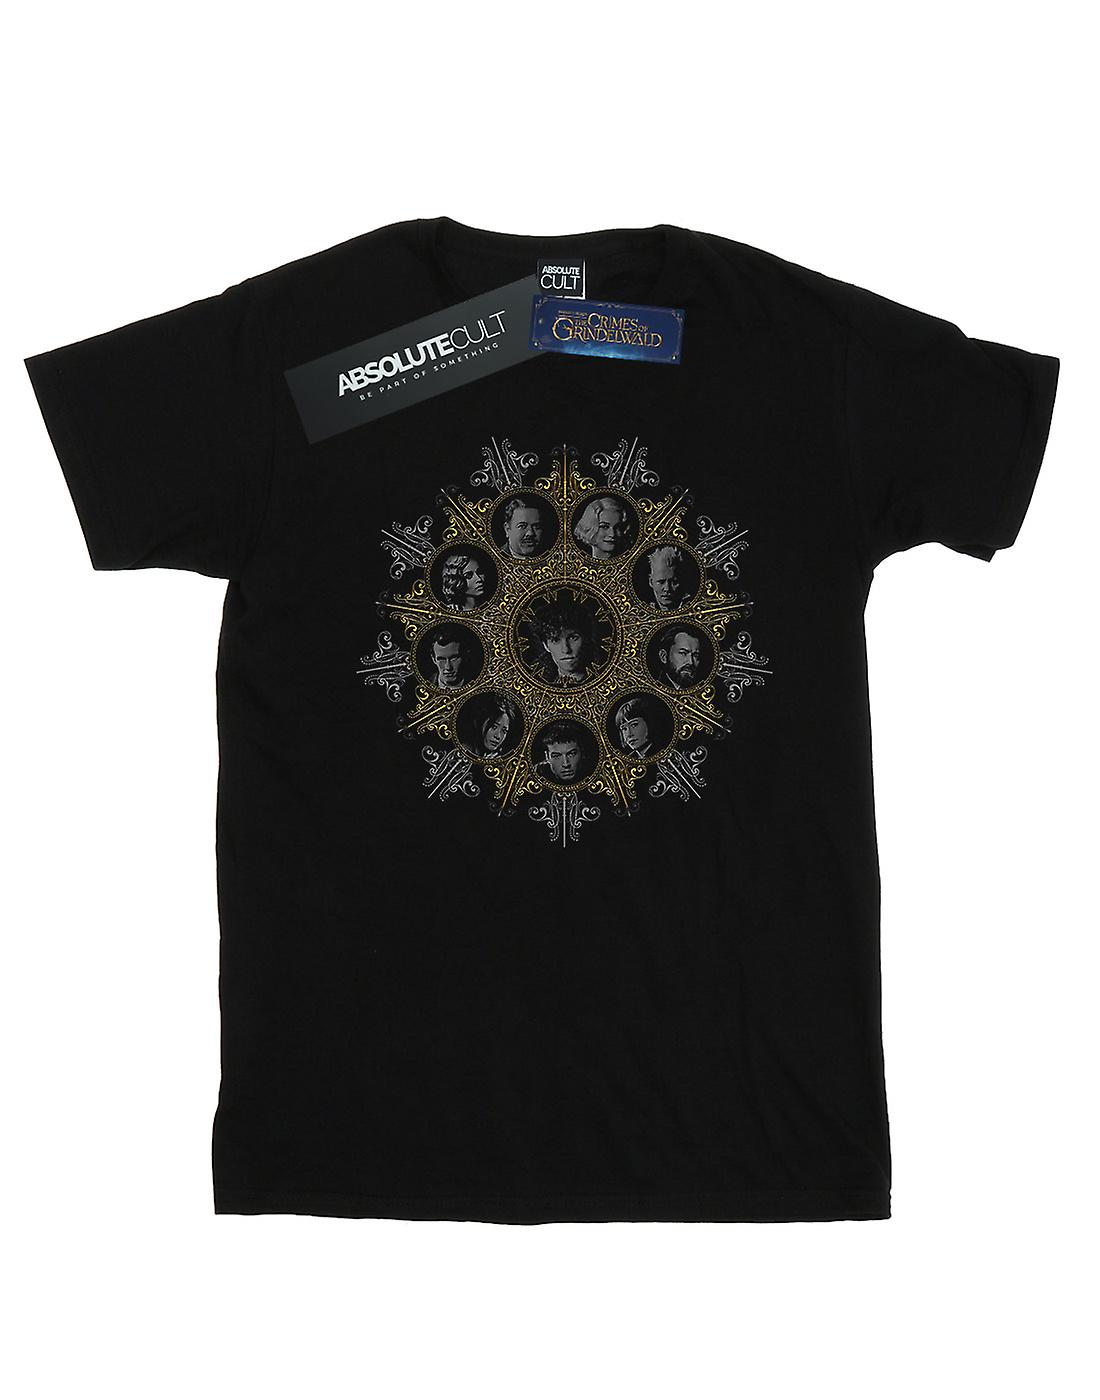 Fantastic Beasts Women's Character Crest Boyfriend Fit T-Shirt